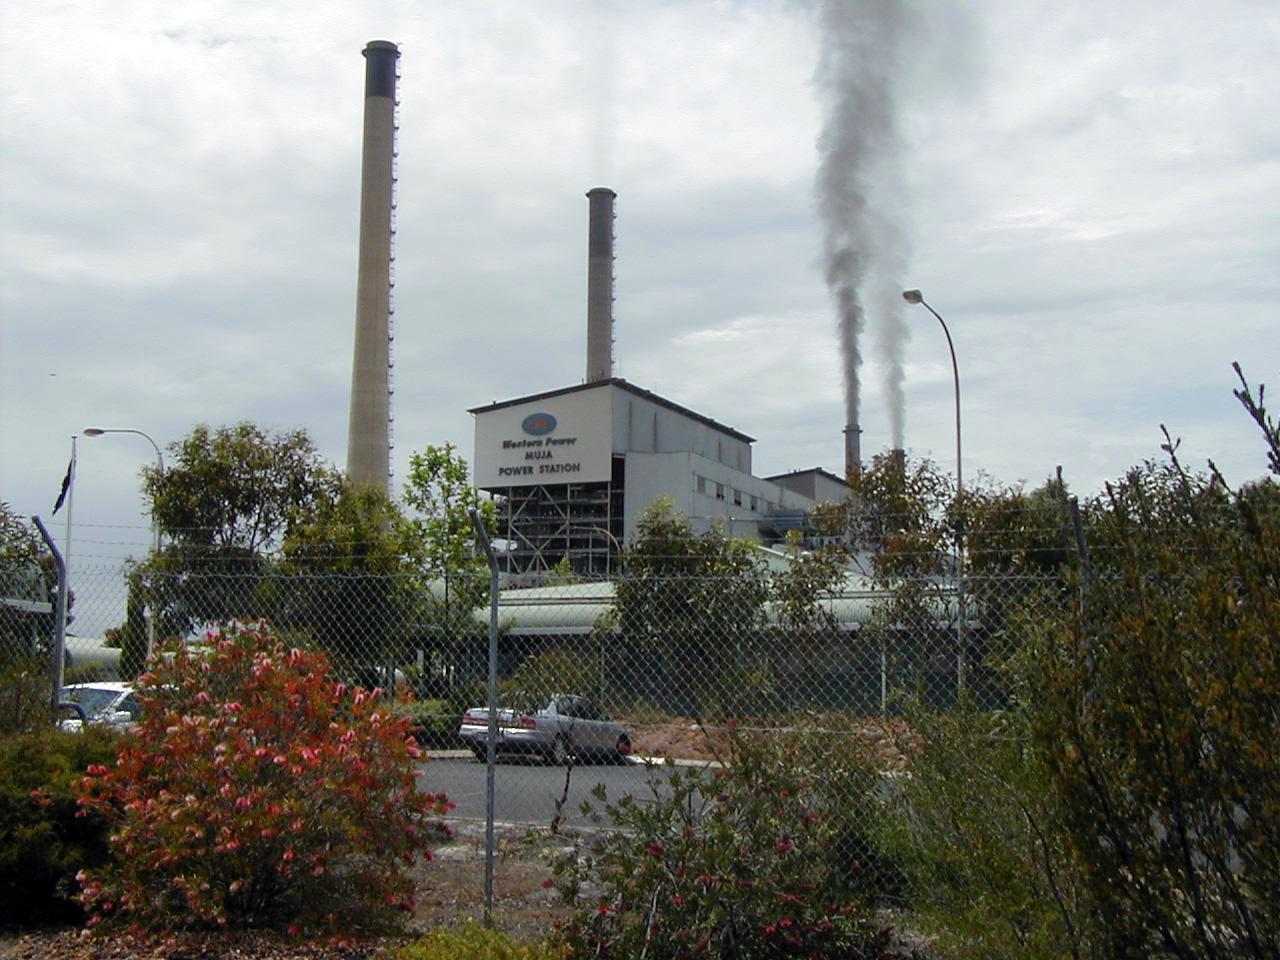 http://upload.wikimedia.org/wikipedia/commons/f/f7/Muja_Power_Station.jpg